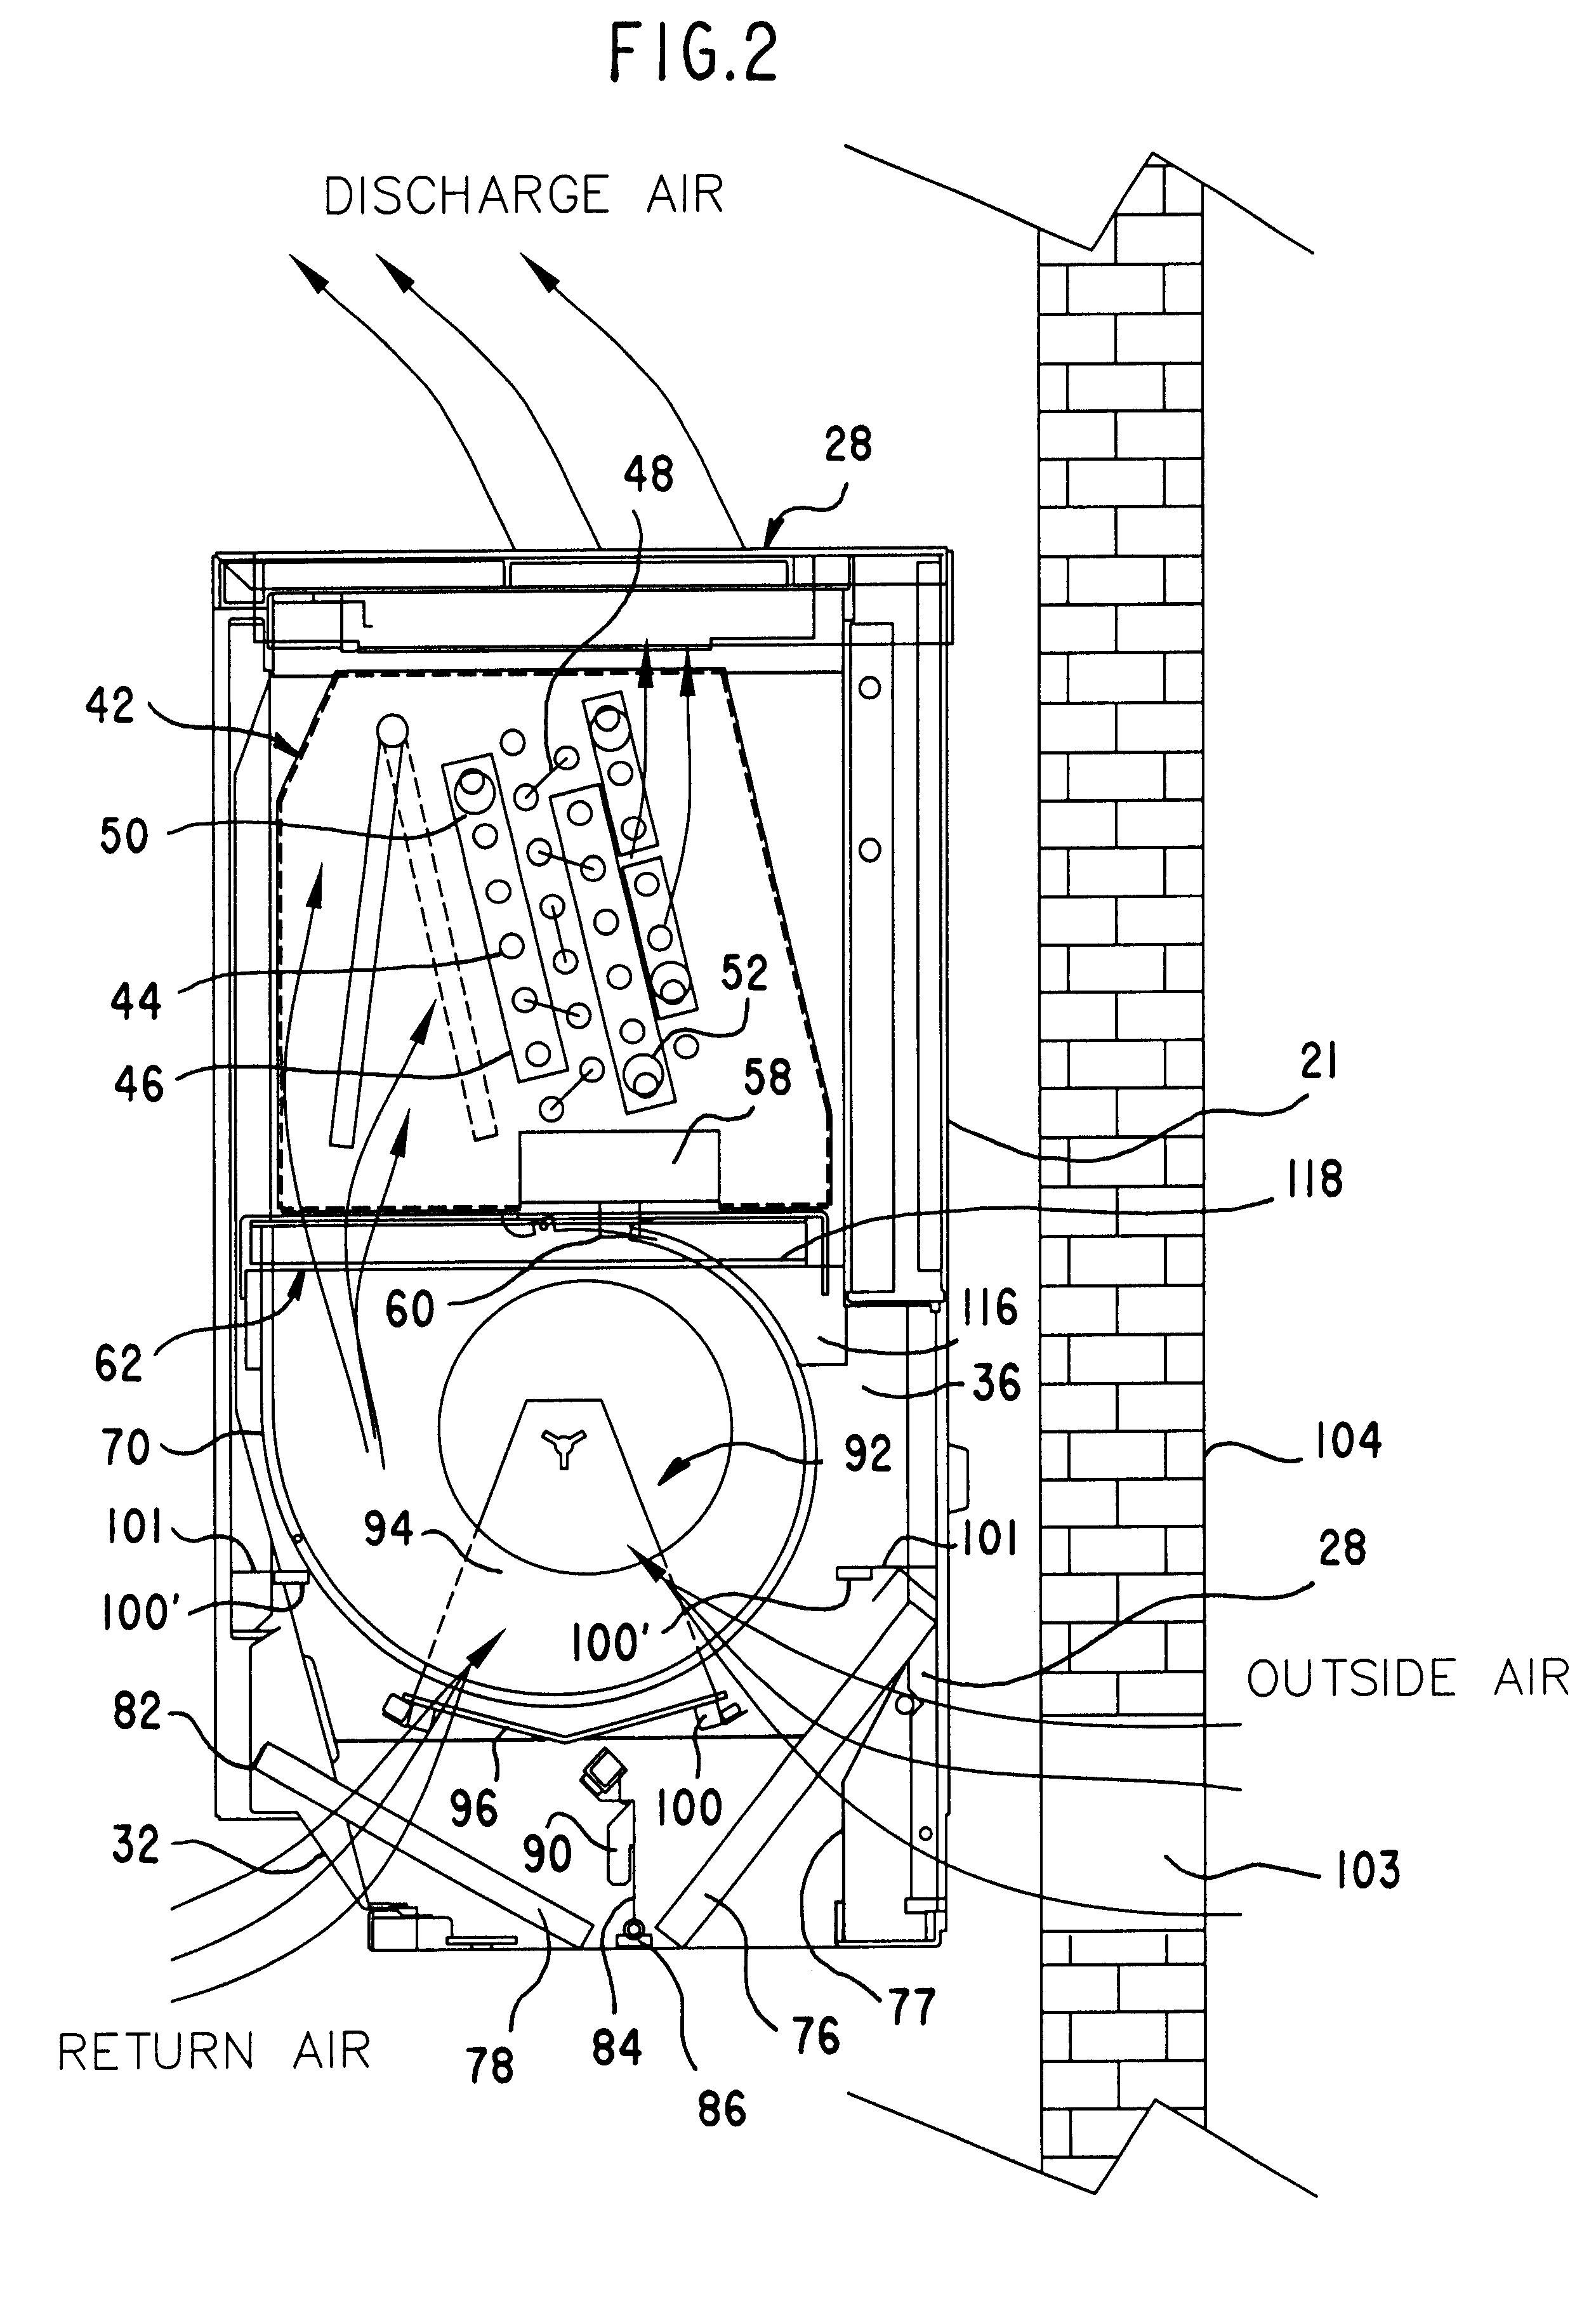 typical wiring diagram hvac unit ventilator   43 wiring diagram images